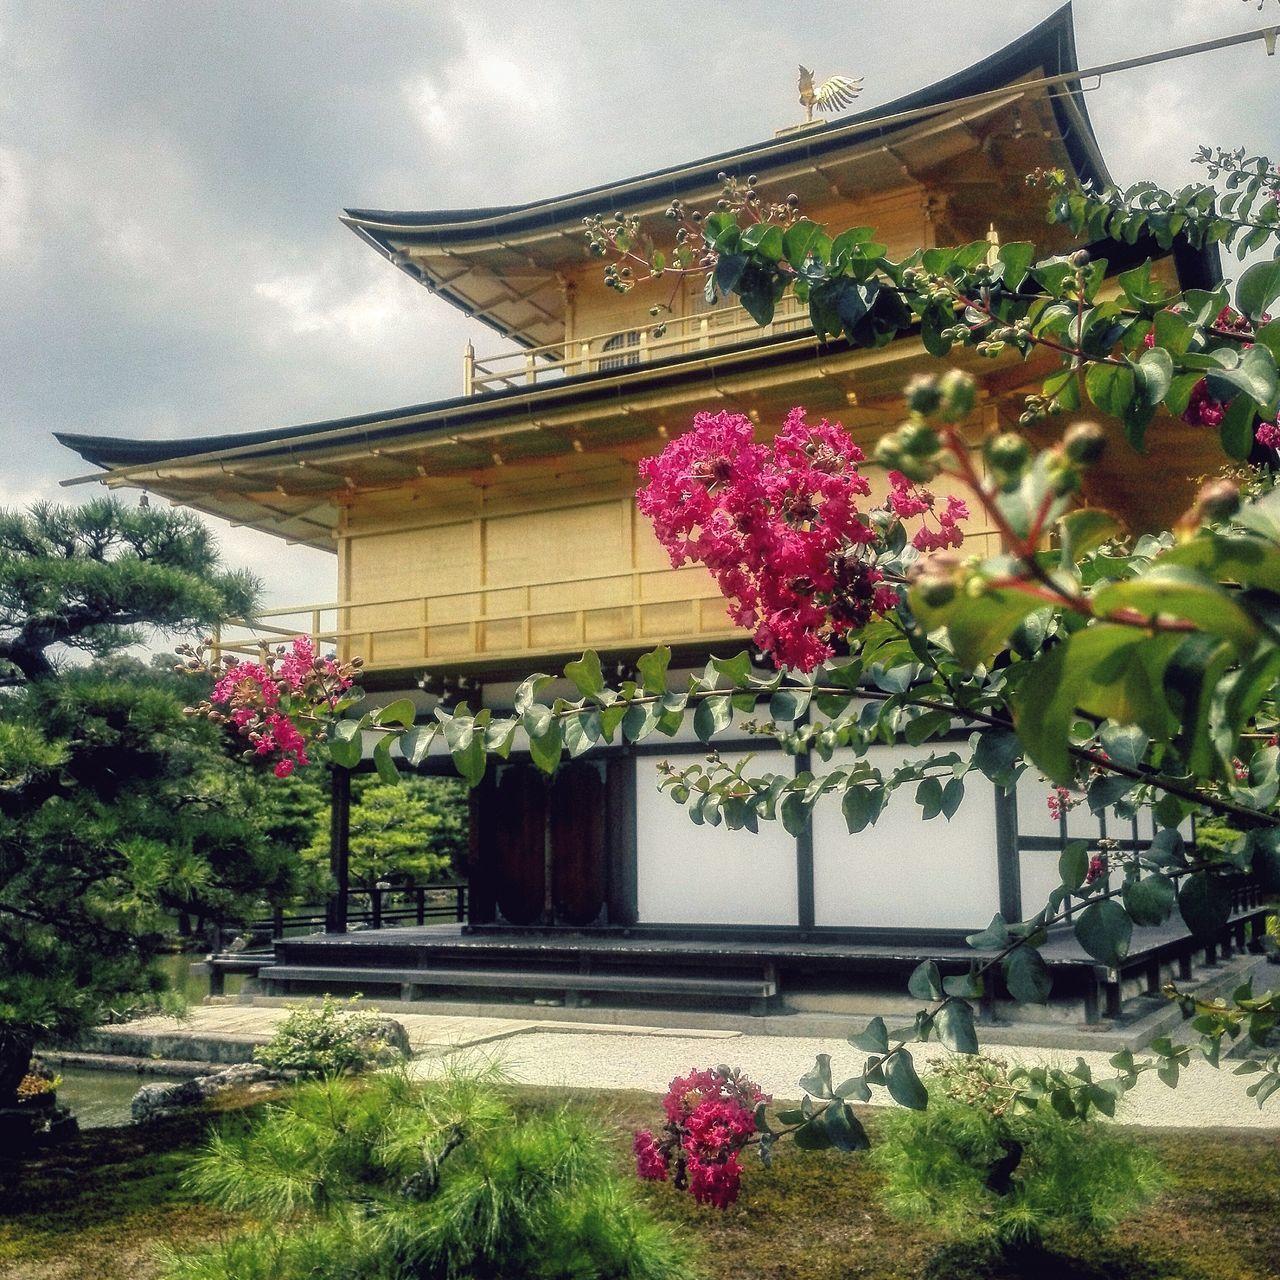 Flower Flora Outdoors Building Exterior Architecture Temple Japan Zen Garden Kyoto Meditation Buddhism